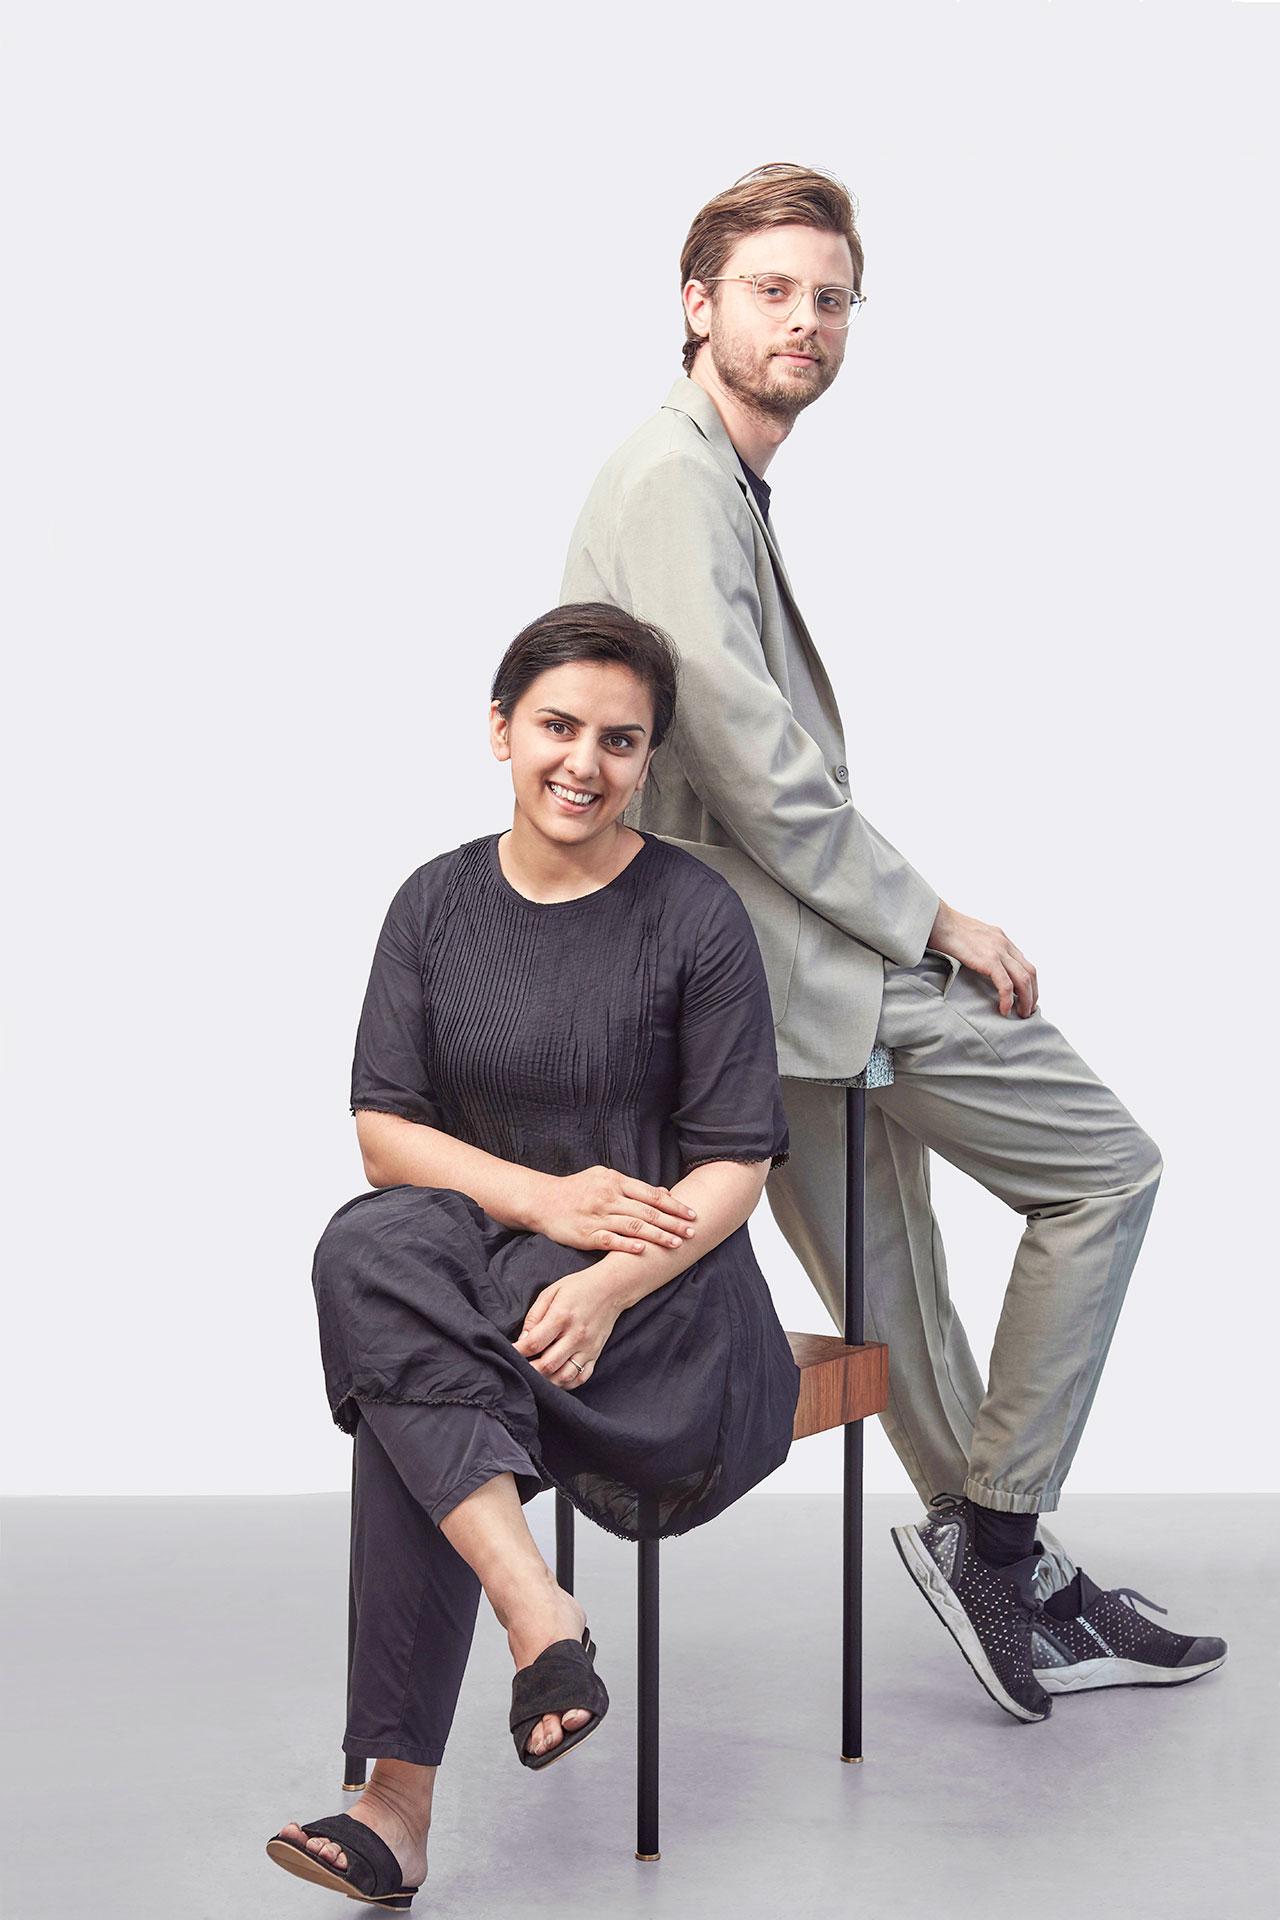 Pascal Hien & Nikita Bhate portrait. Photo bySameer Belvalkar.